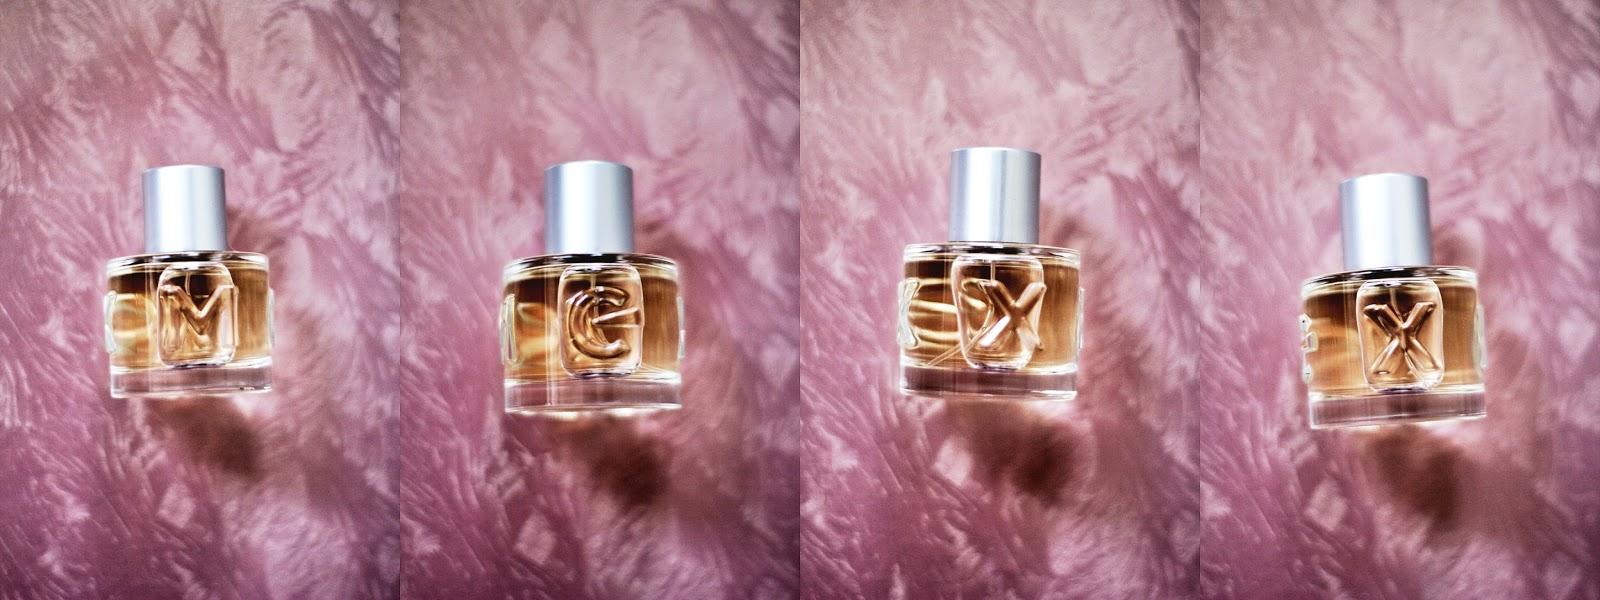 mexx parfüms flakon buchstaben